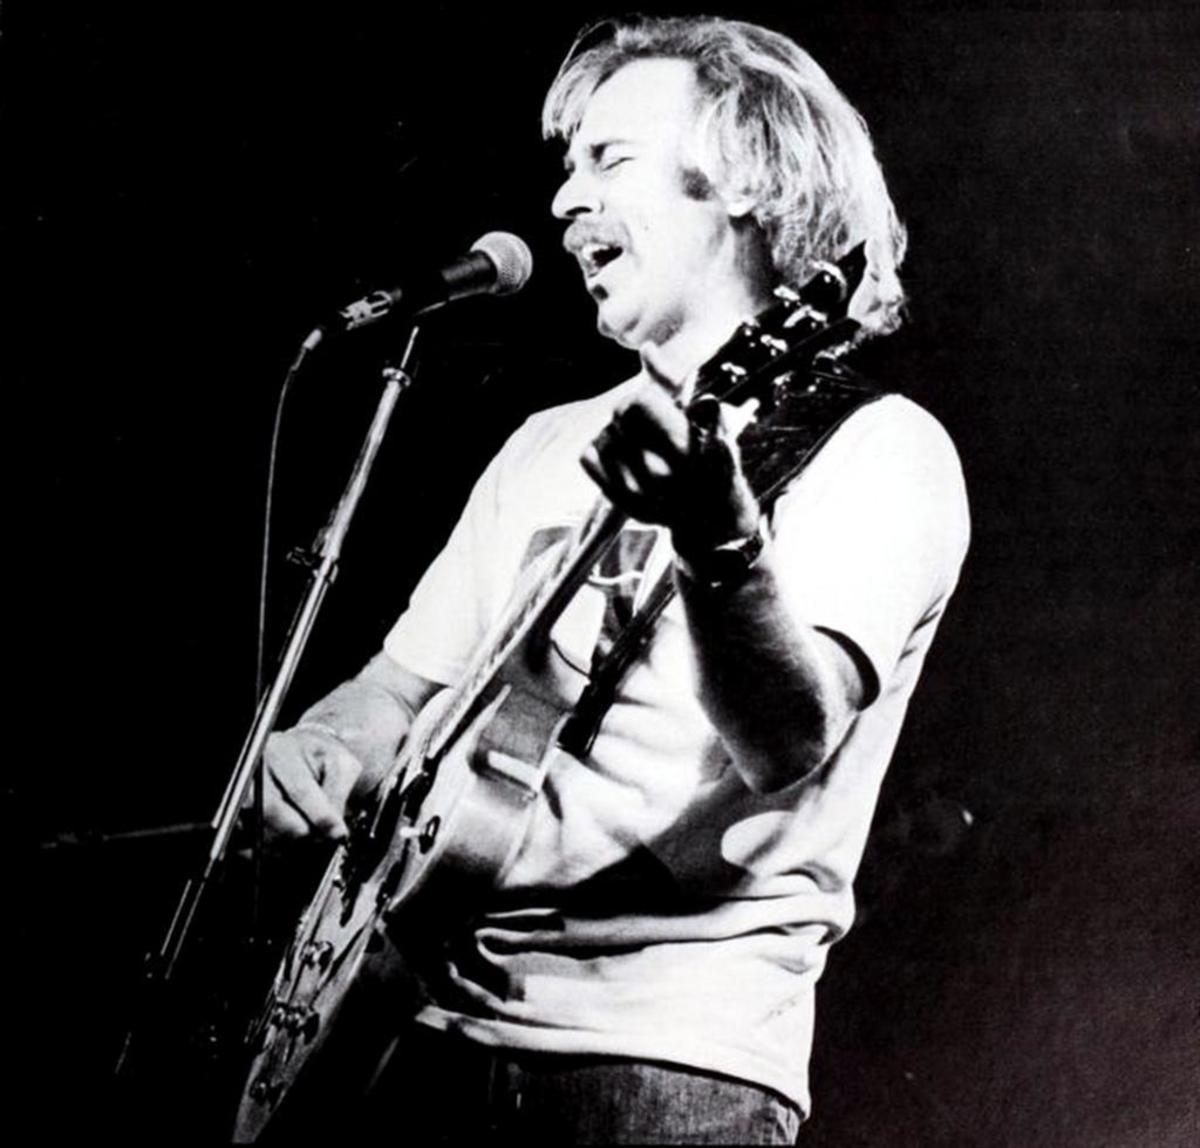 Jimmy Buffett performing at Clemson University, February 25, 1977.